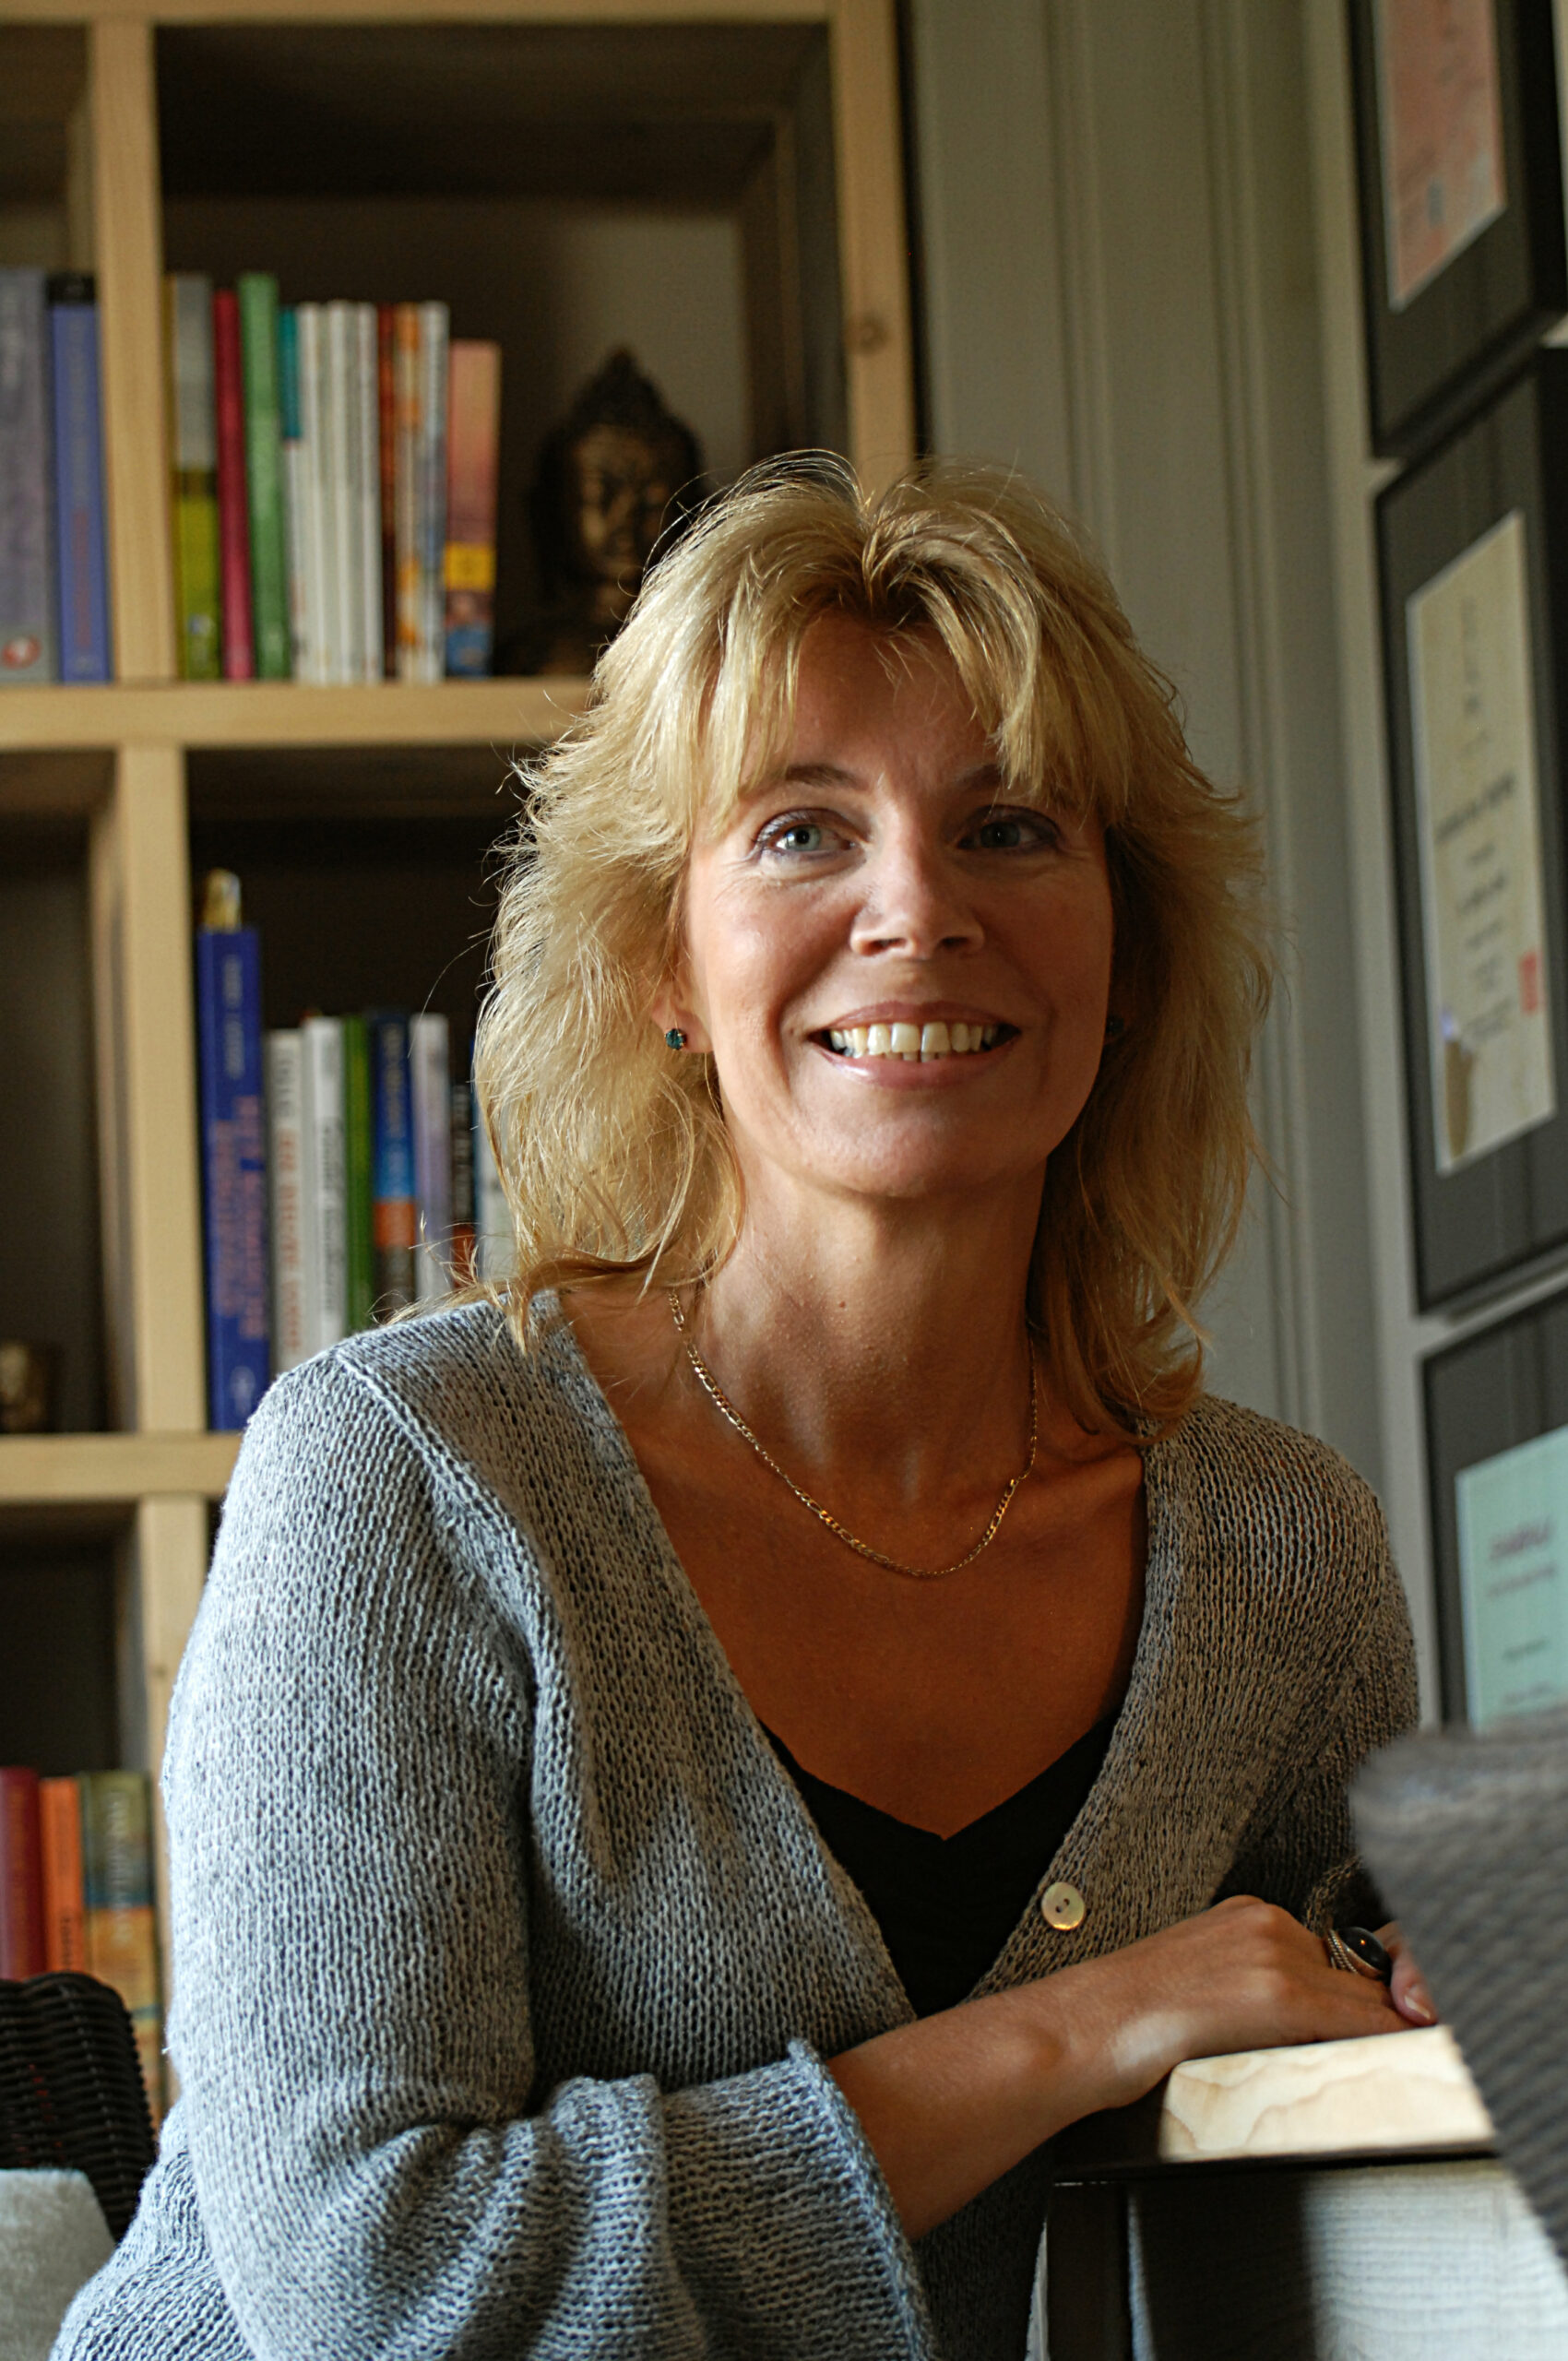 Marleen van Wegberg